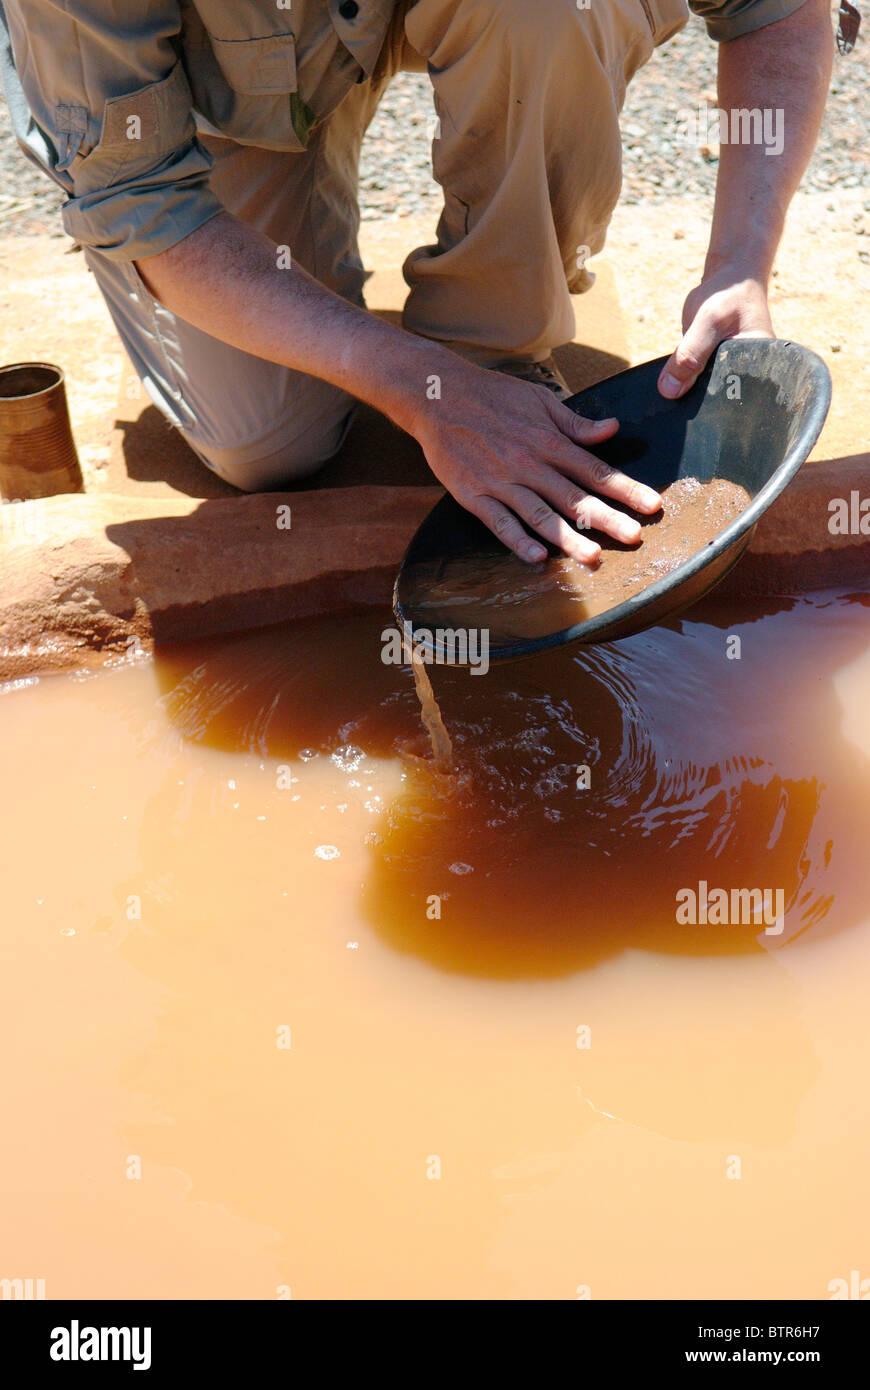 Australia, Kalgoorlie, Mining Hall of Fame, Person doing gold panning - Stock Image